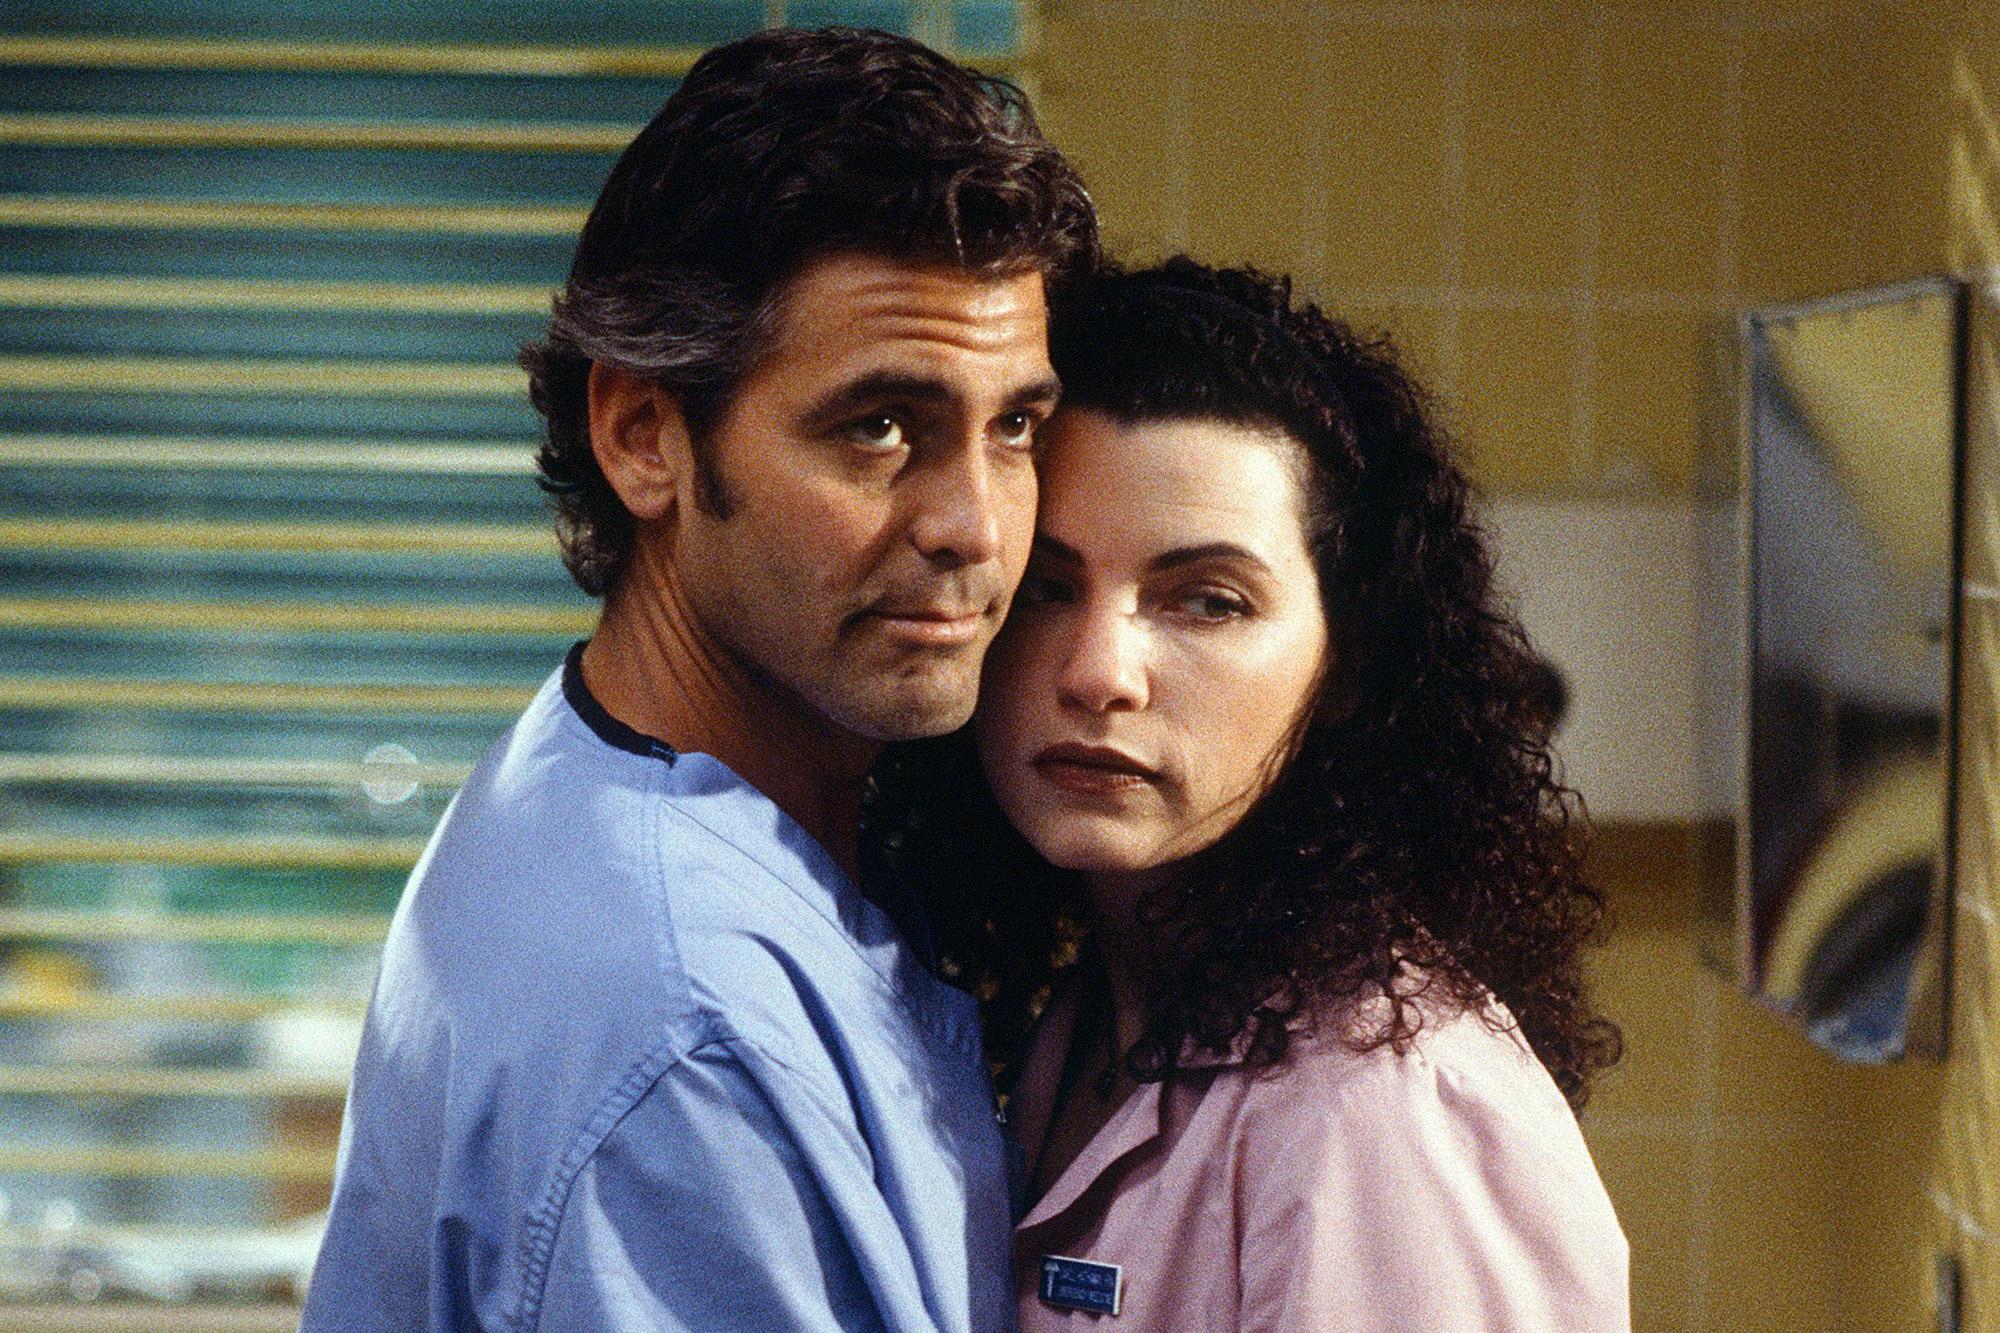 ER George Clooney as Doctor Doug Ross, Julianna Margulies as Nurse Carol Hathaway